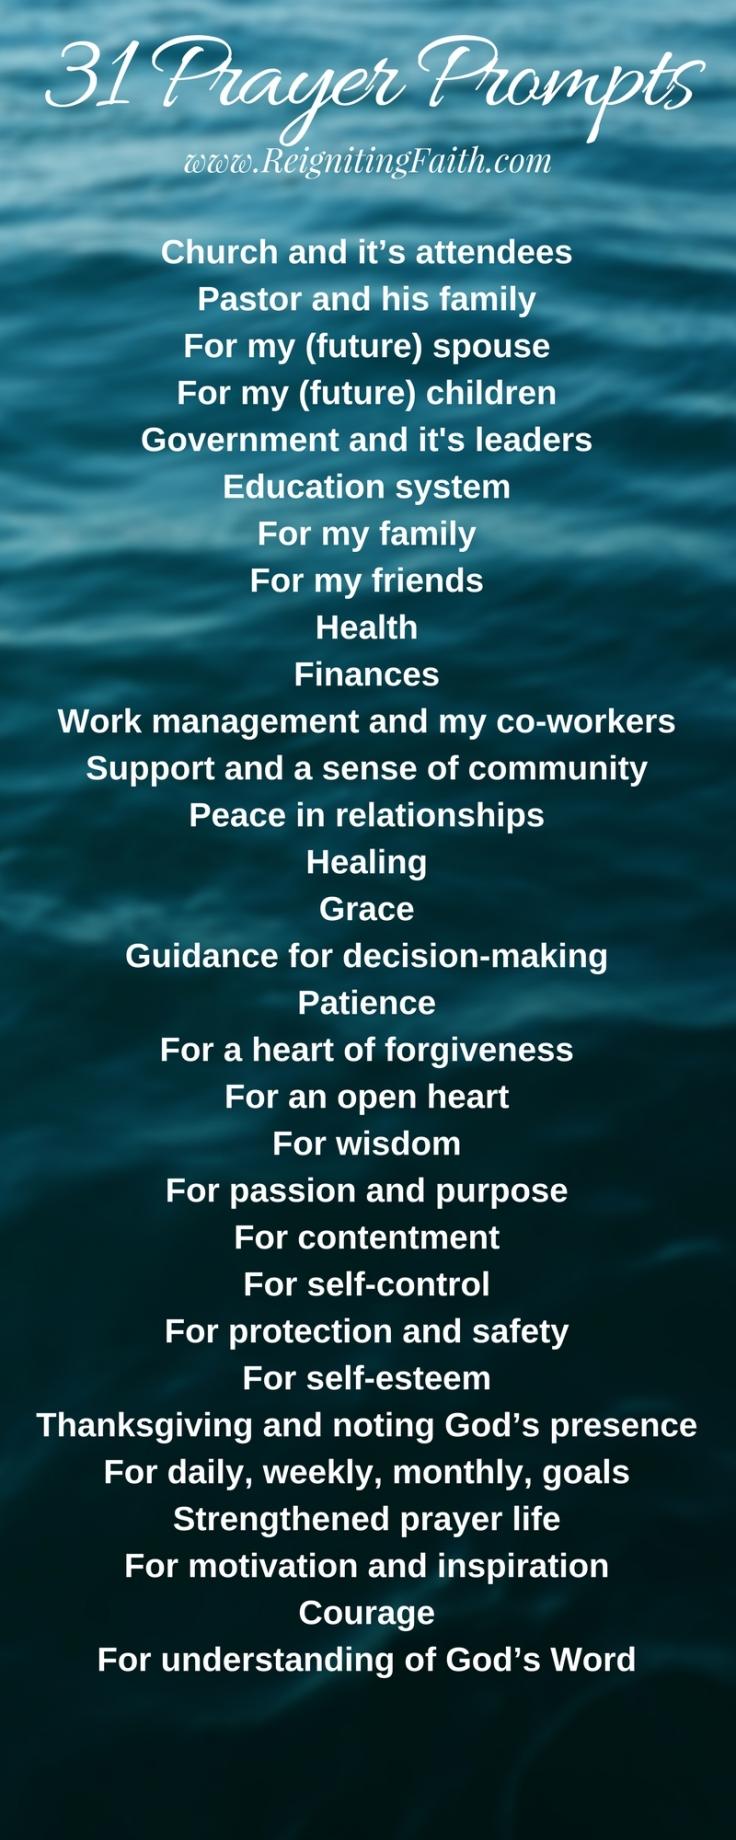 31 Prayer Prompts